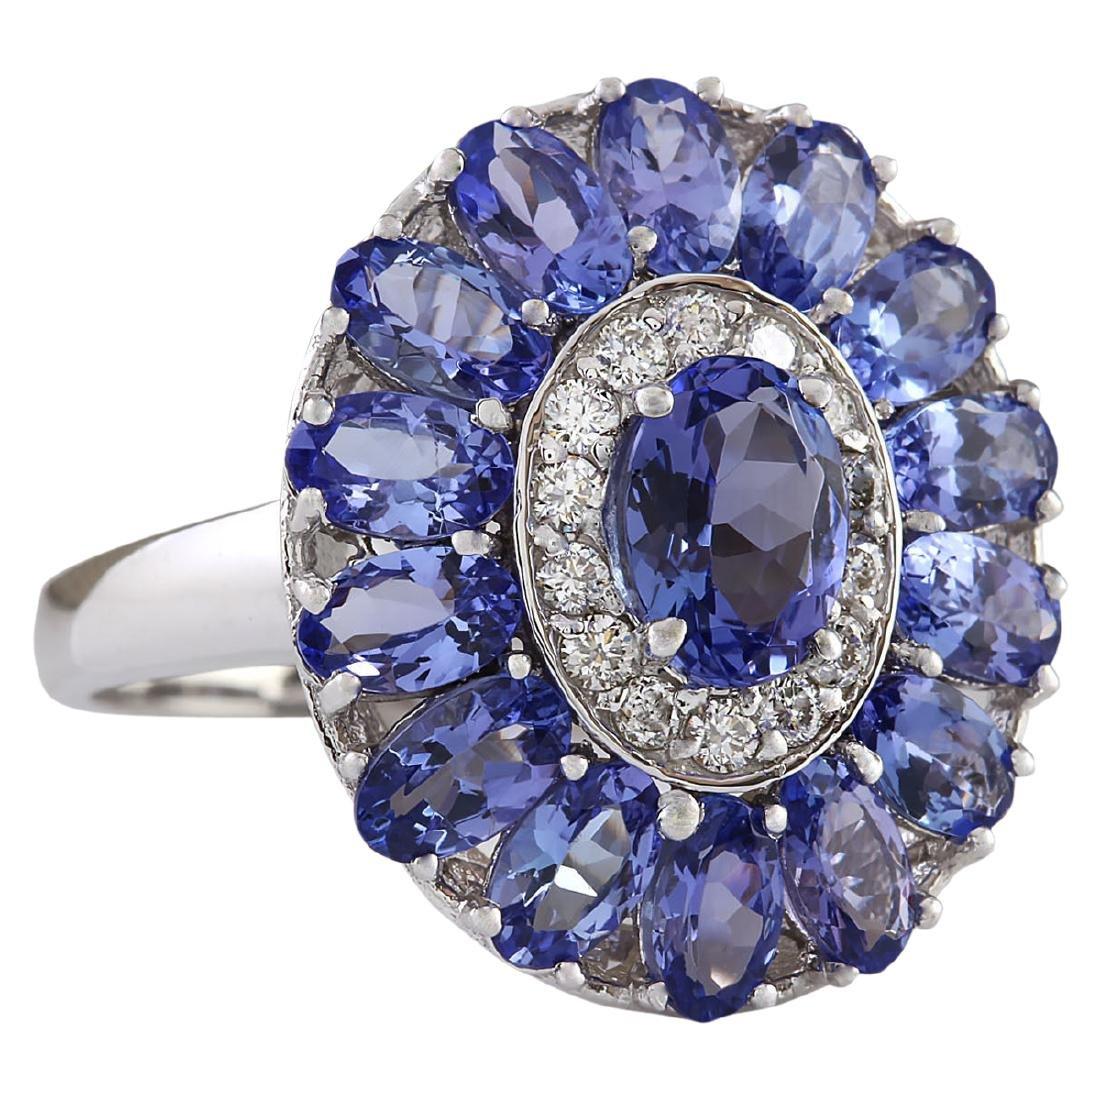 4.77 CTW Natural Tanzanite And Diamond Ring In 18K - 2